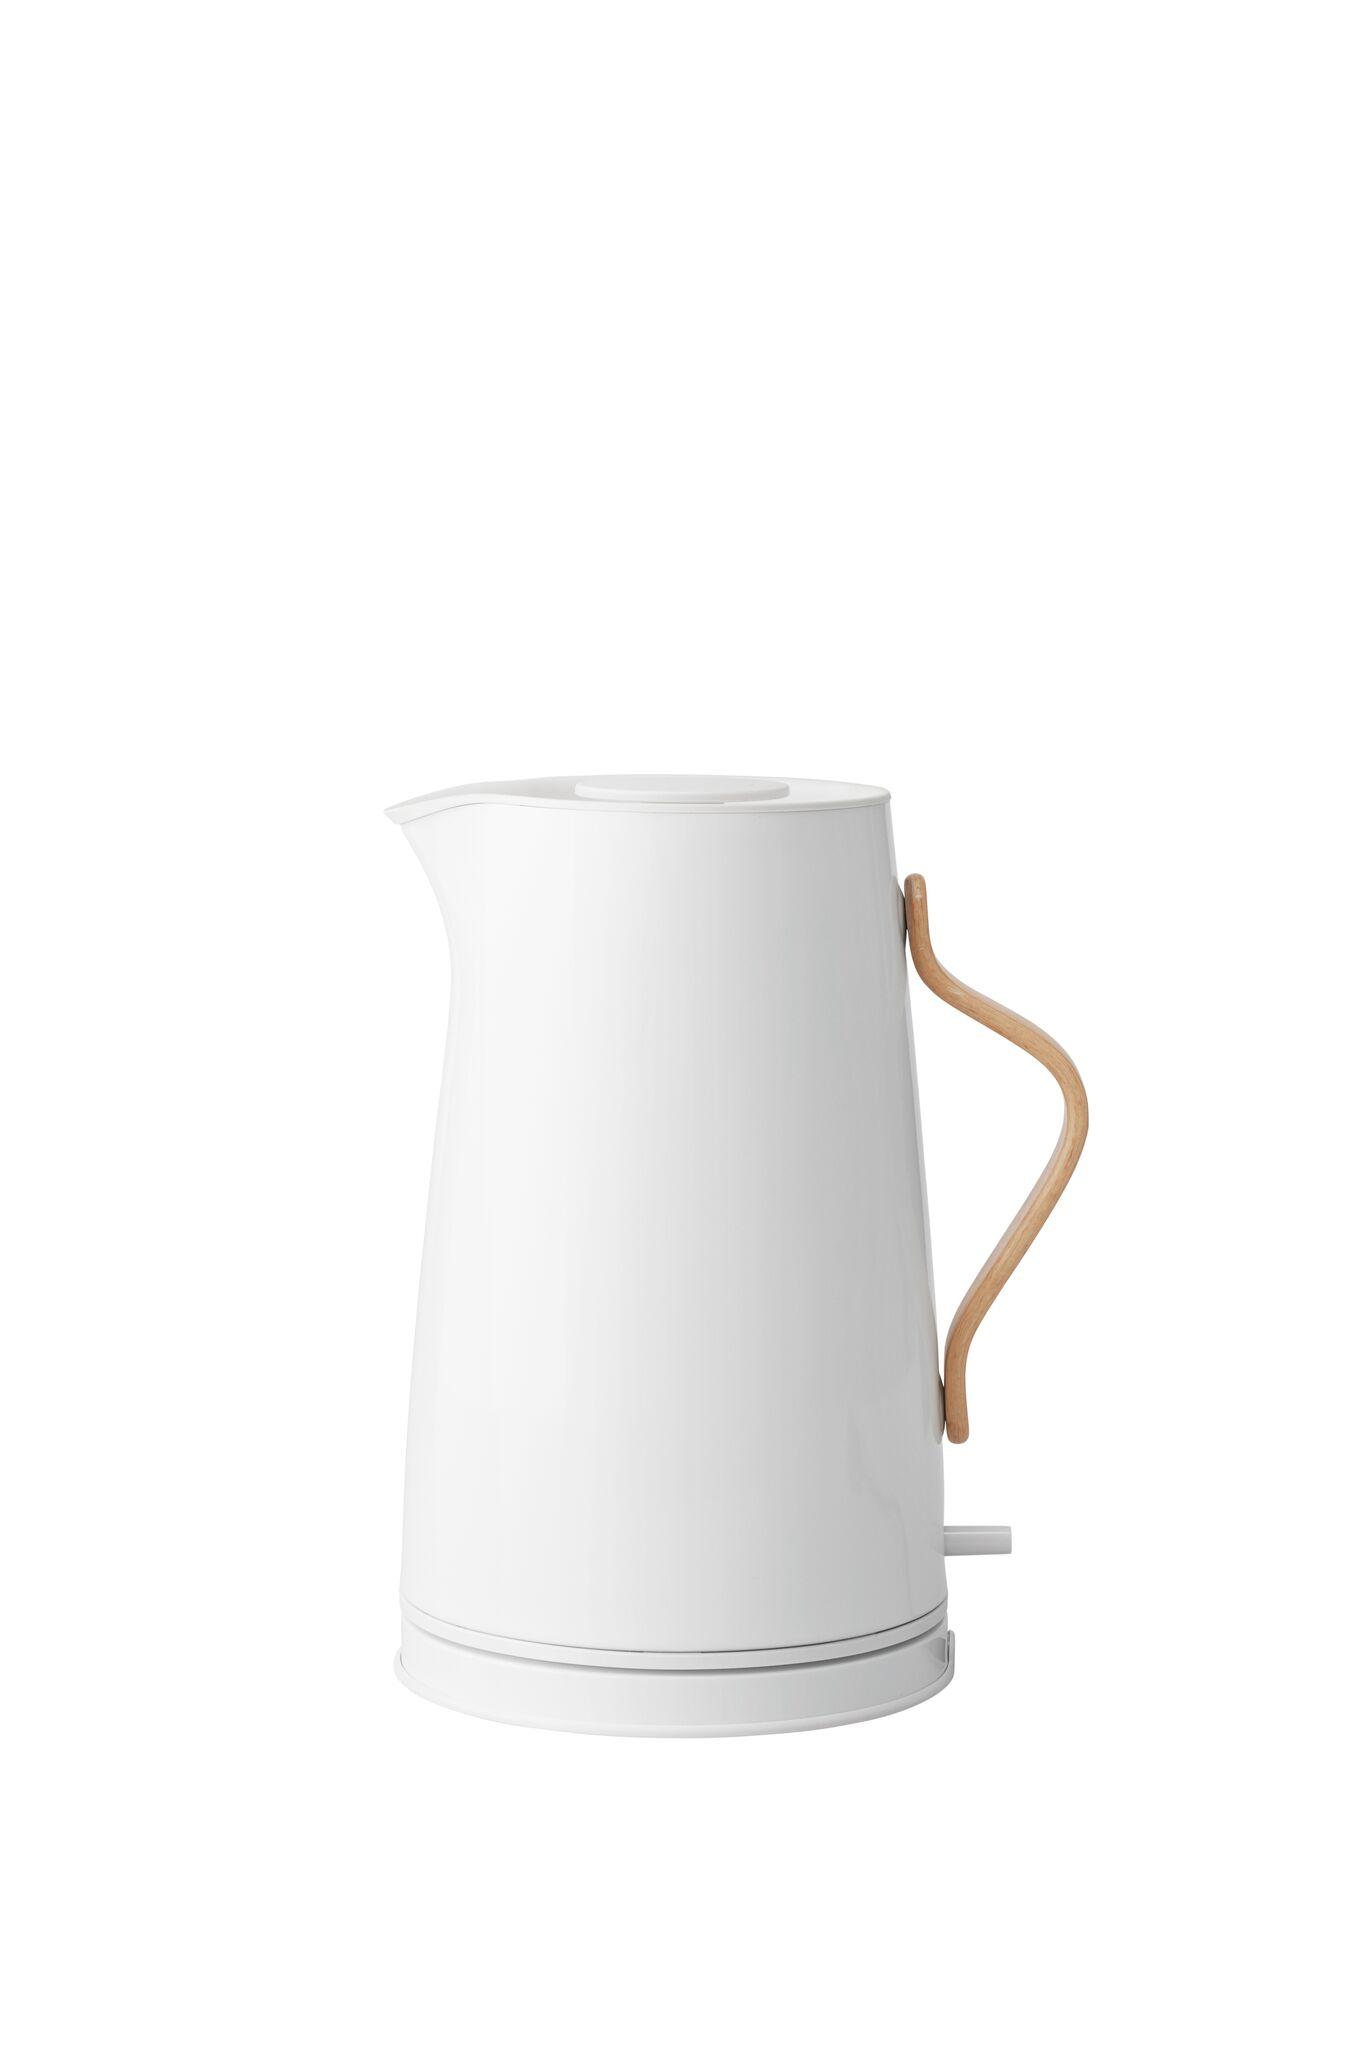 Stelton - Emma Kettle 1,2 L - White Calk (x-210-3)